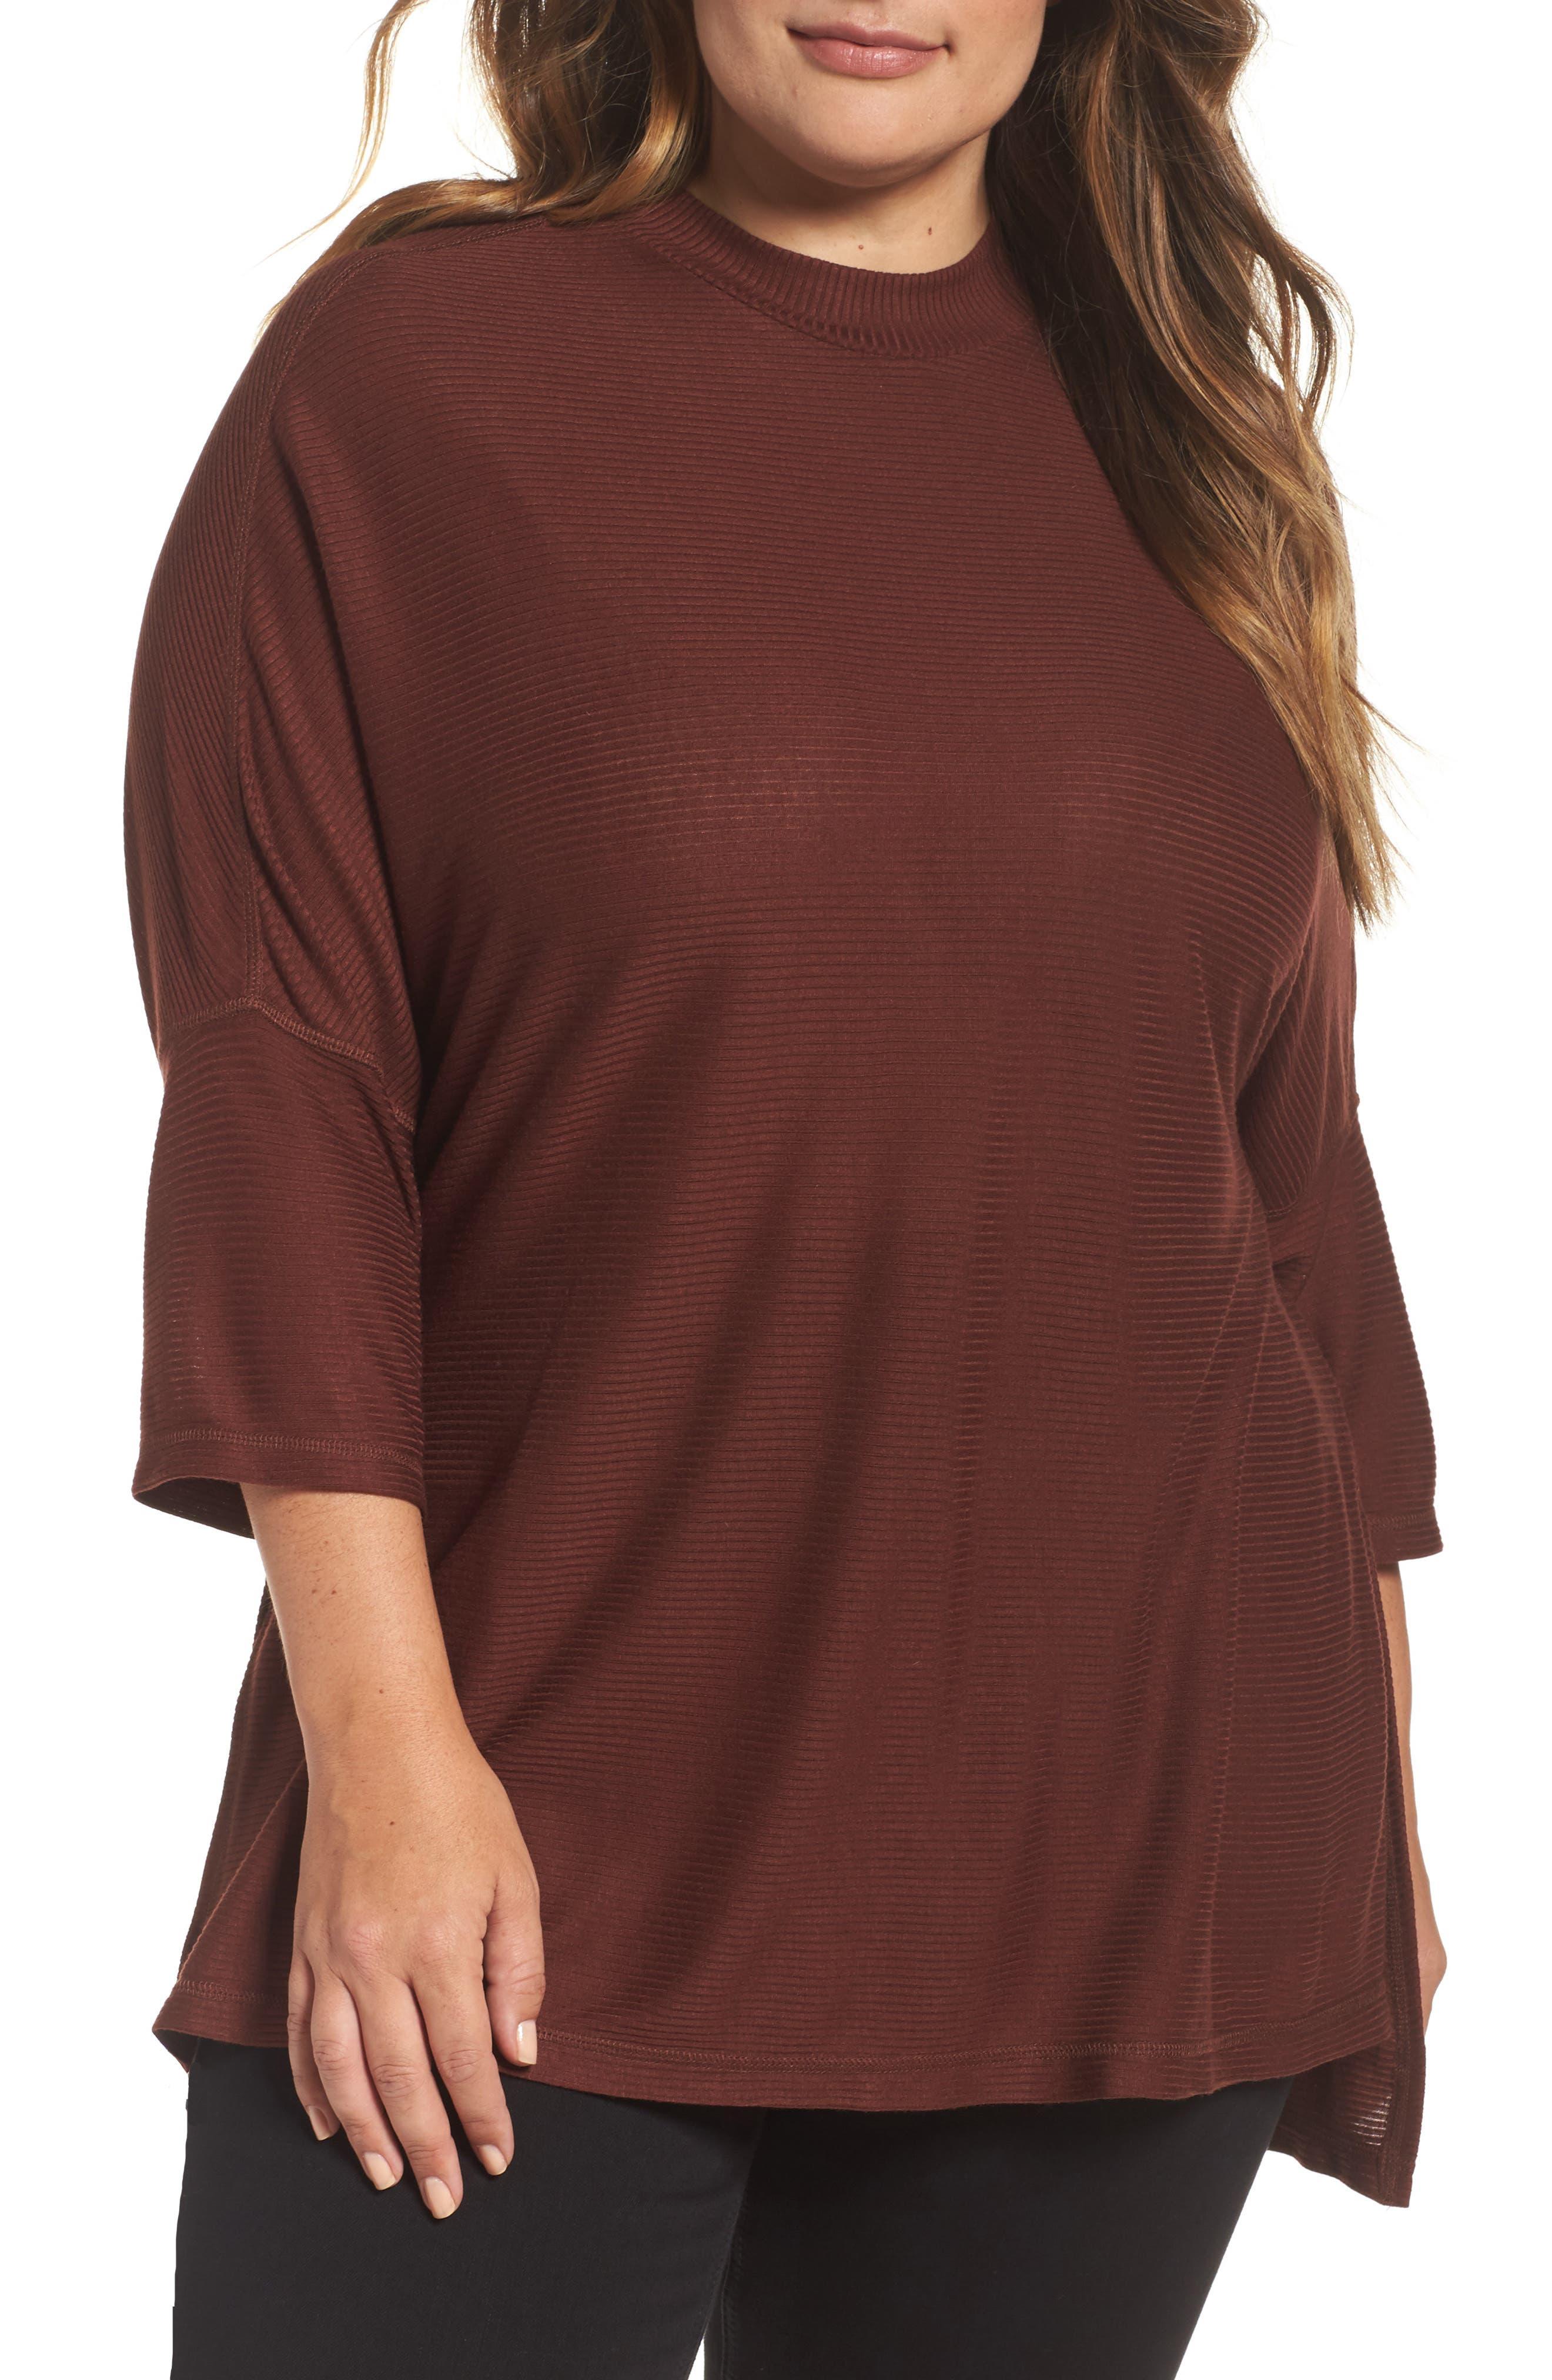 Main Image - Melissa McCarthy Seven7 Mock Neck Rib Knit Top (Plus Size)